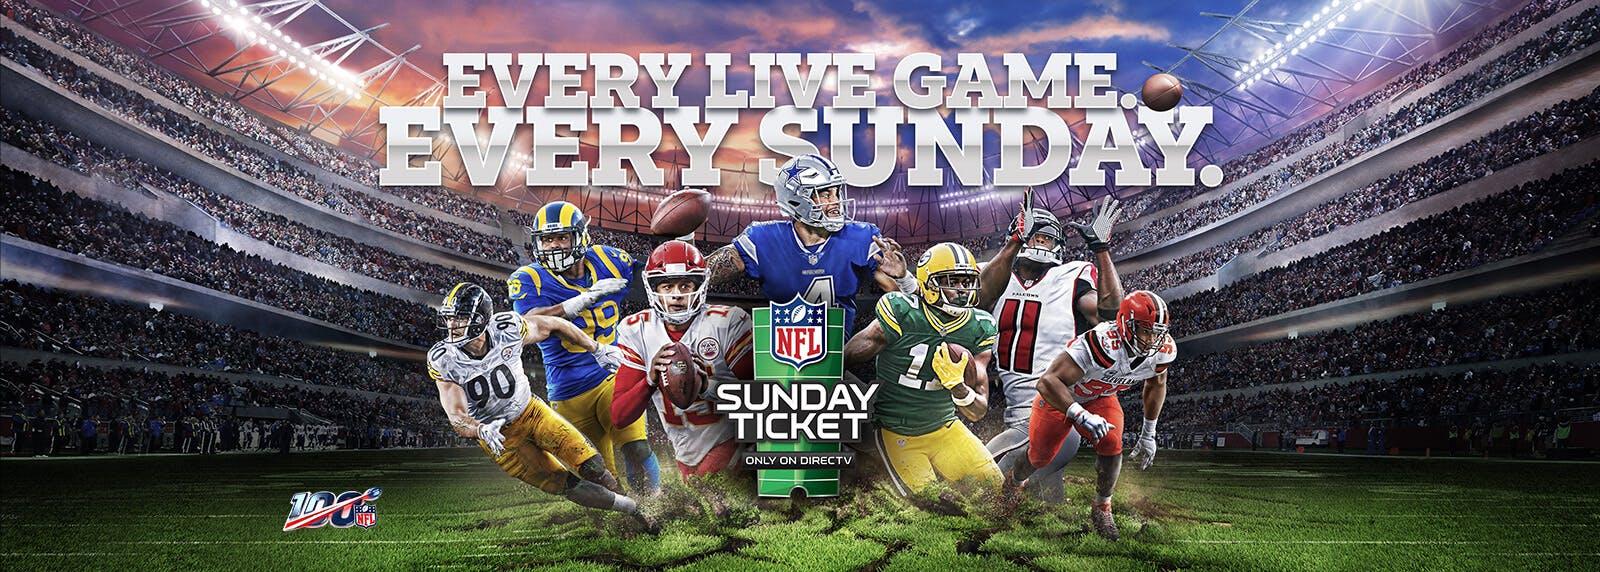 watch chiefs vs texans live stream nfl sunday ticket